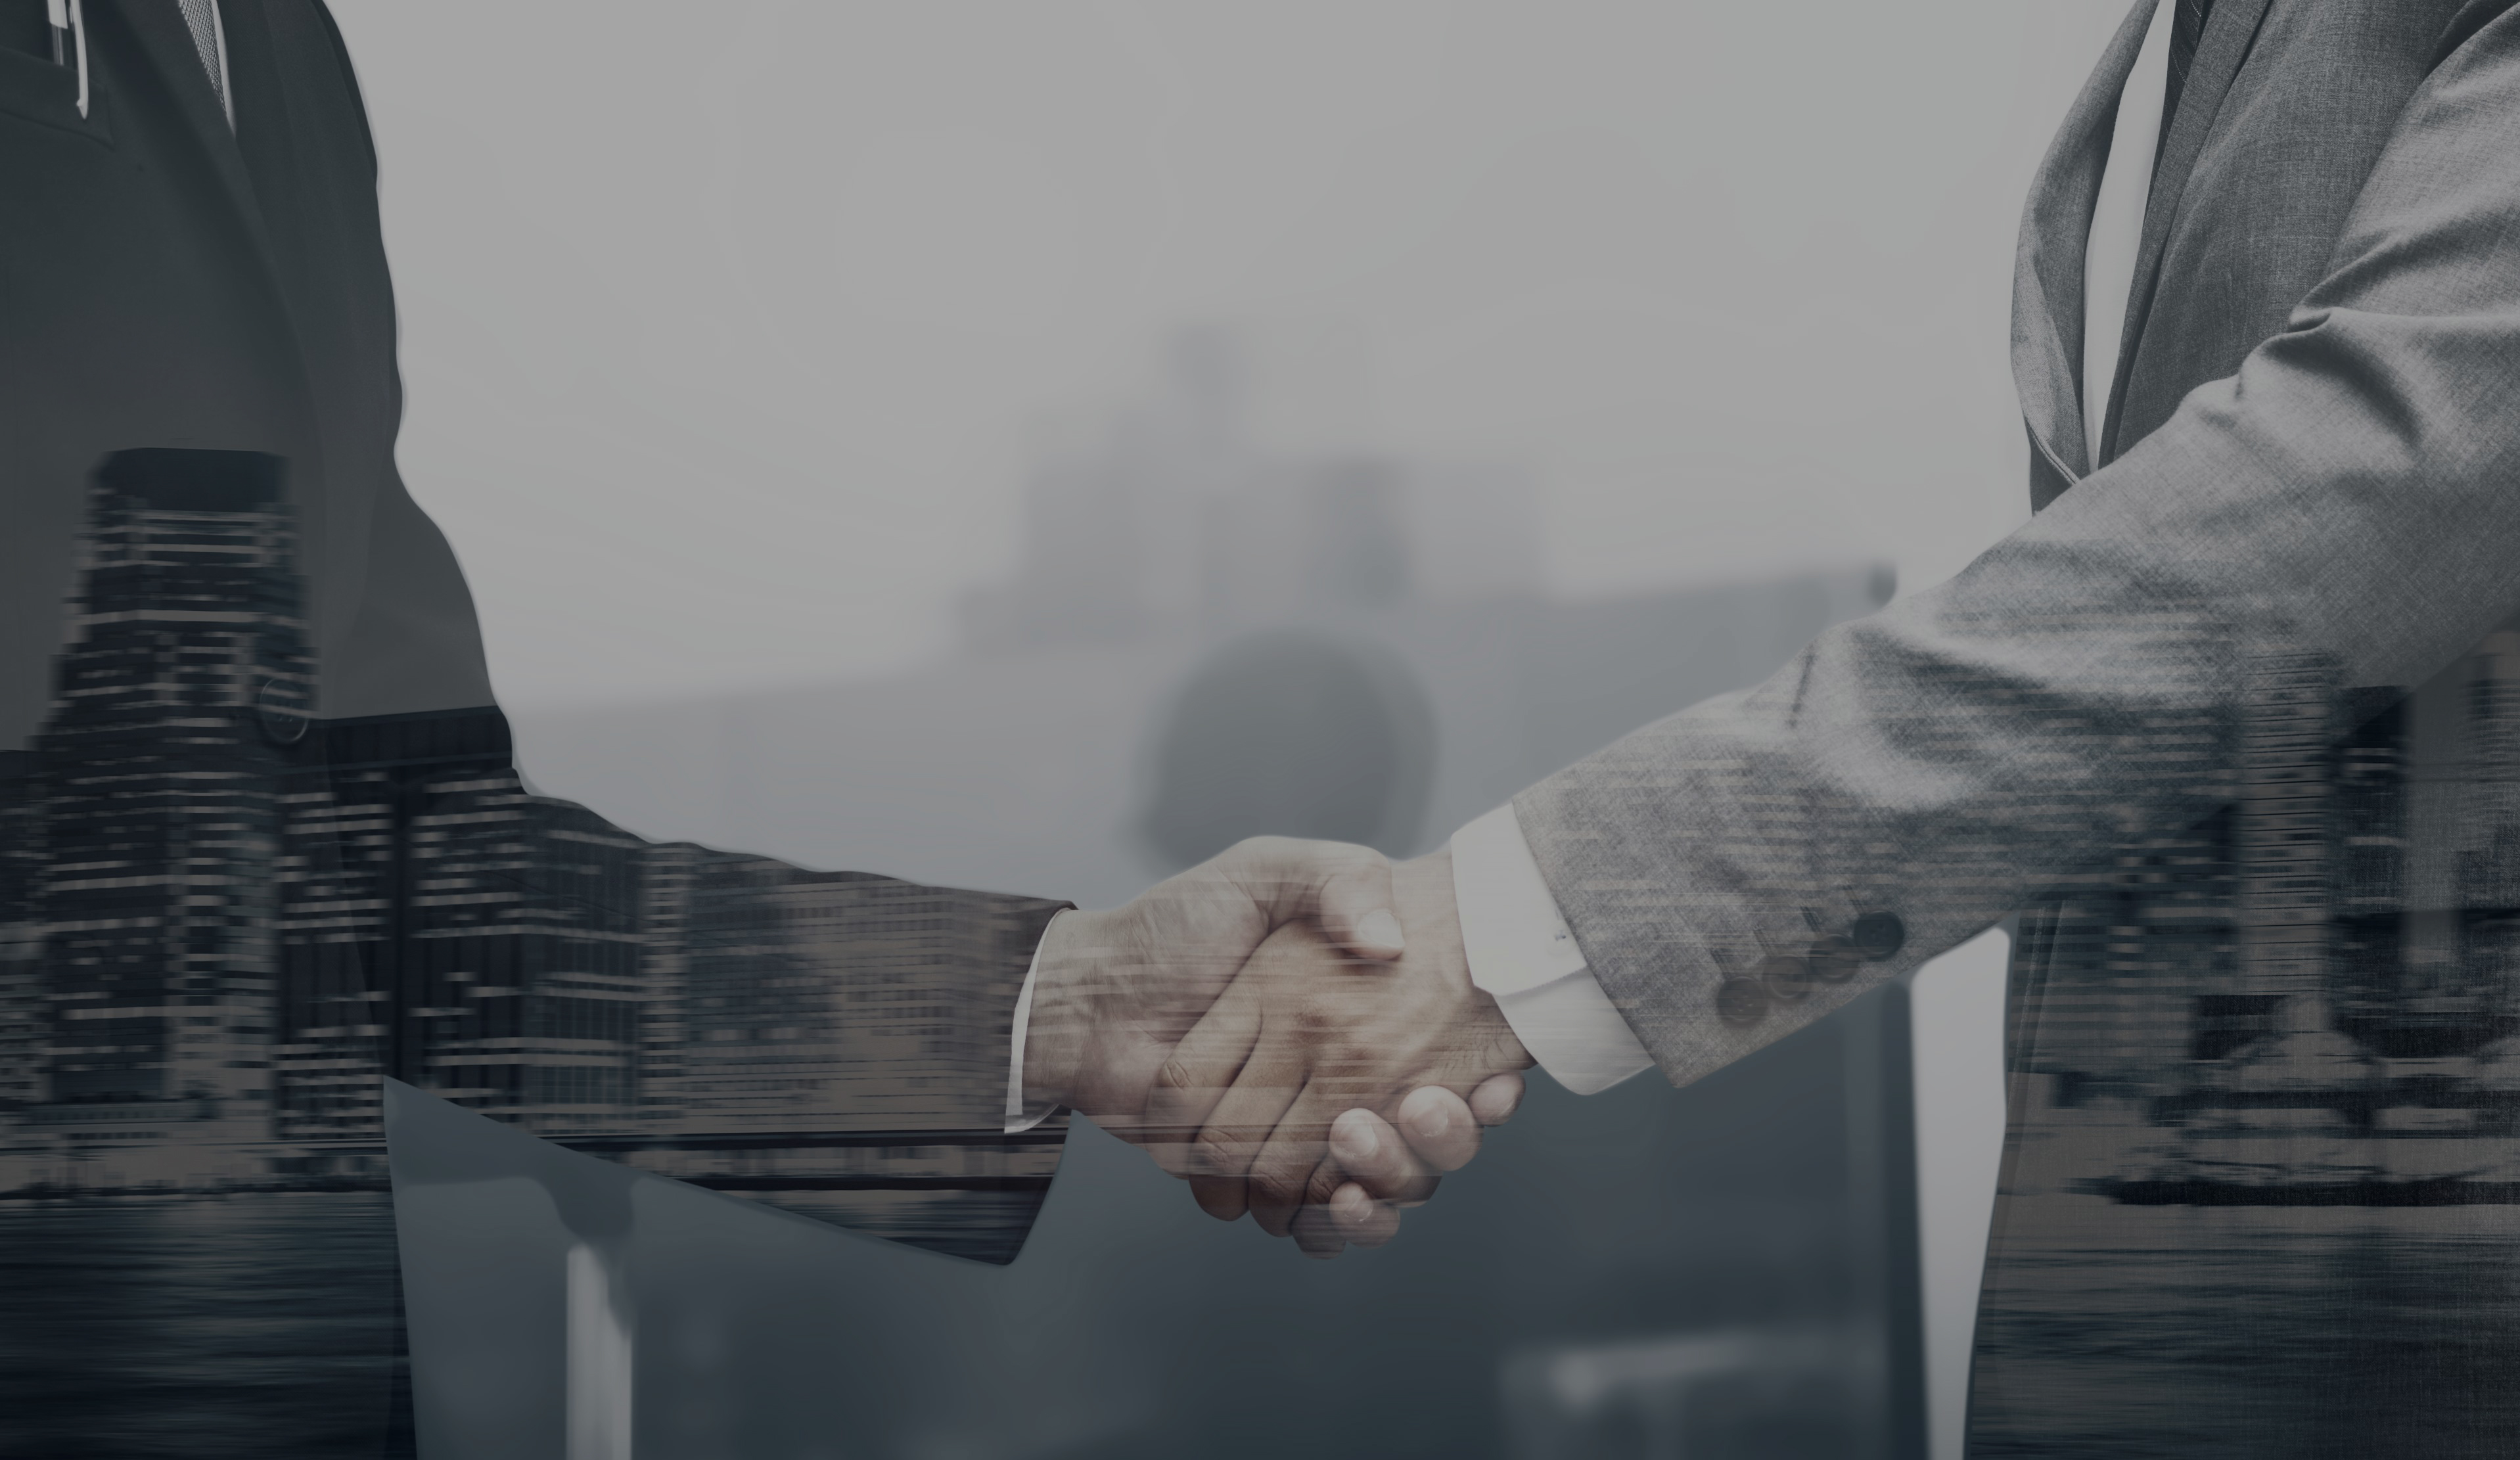 business-partners-handshake-international-business-concept.jpg (1.38 MB)